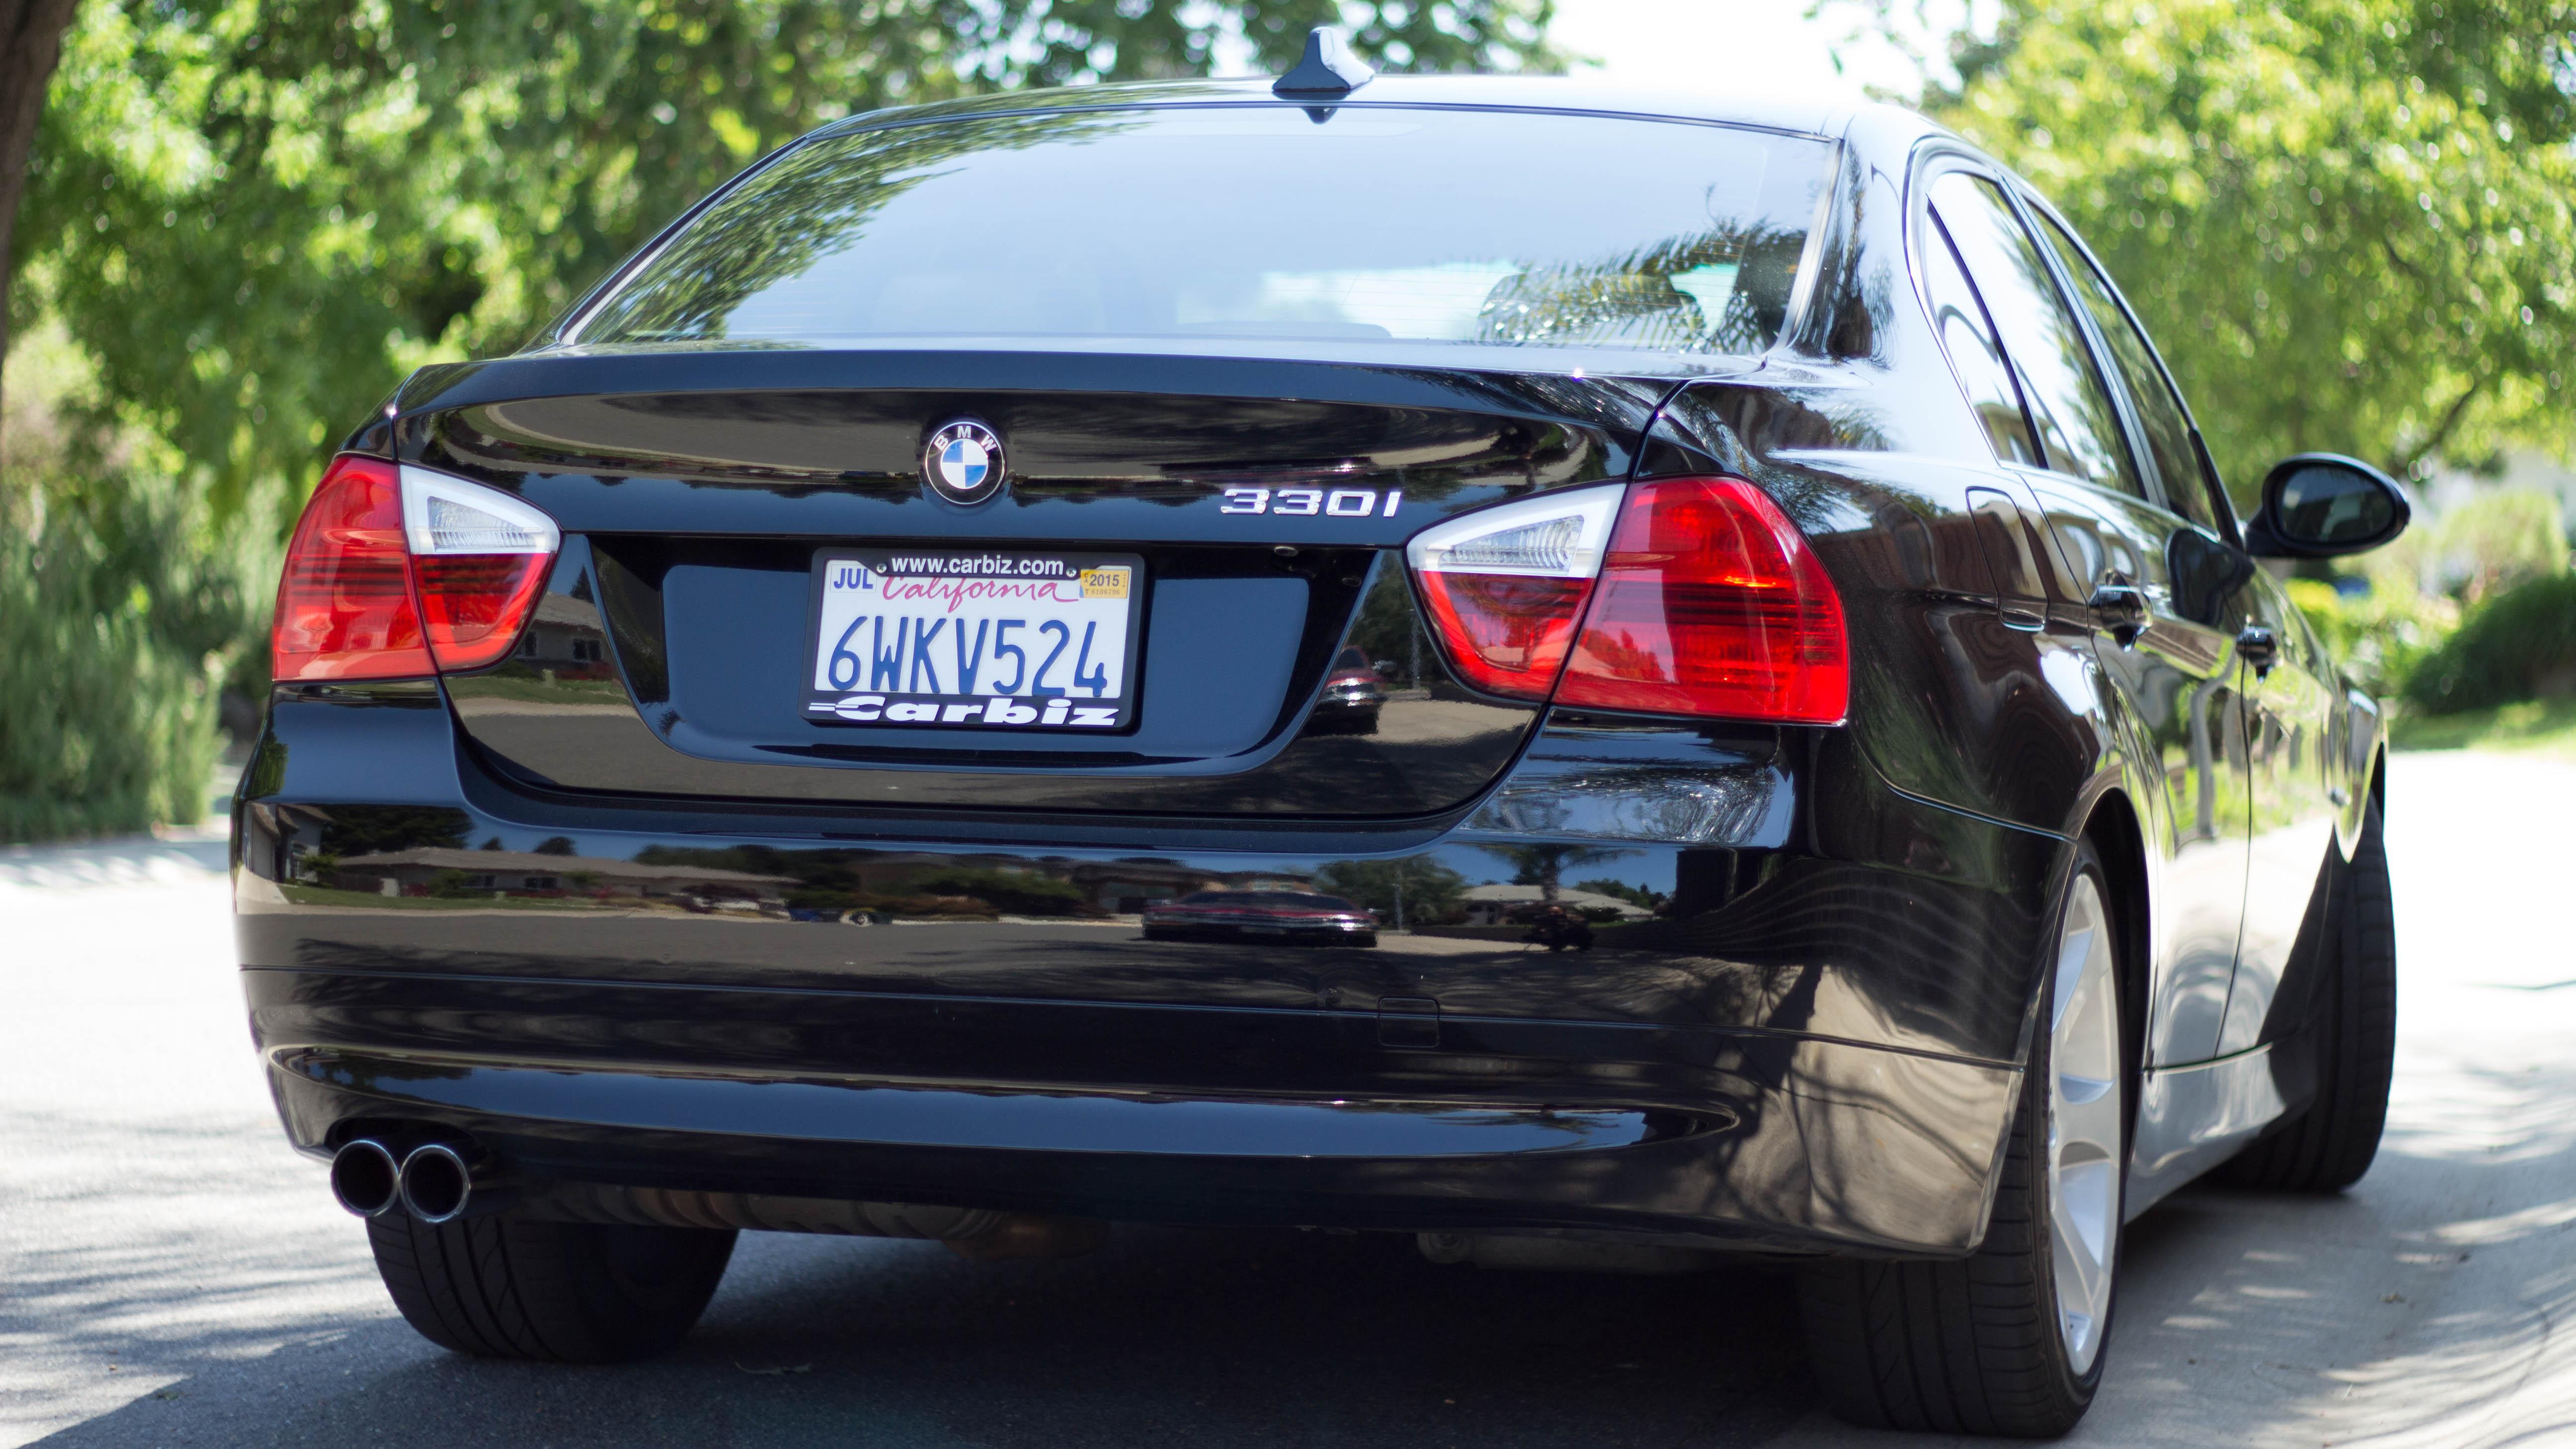 FileRear View Of A BMW E90 330i 2006 Pre LCI Black Color With